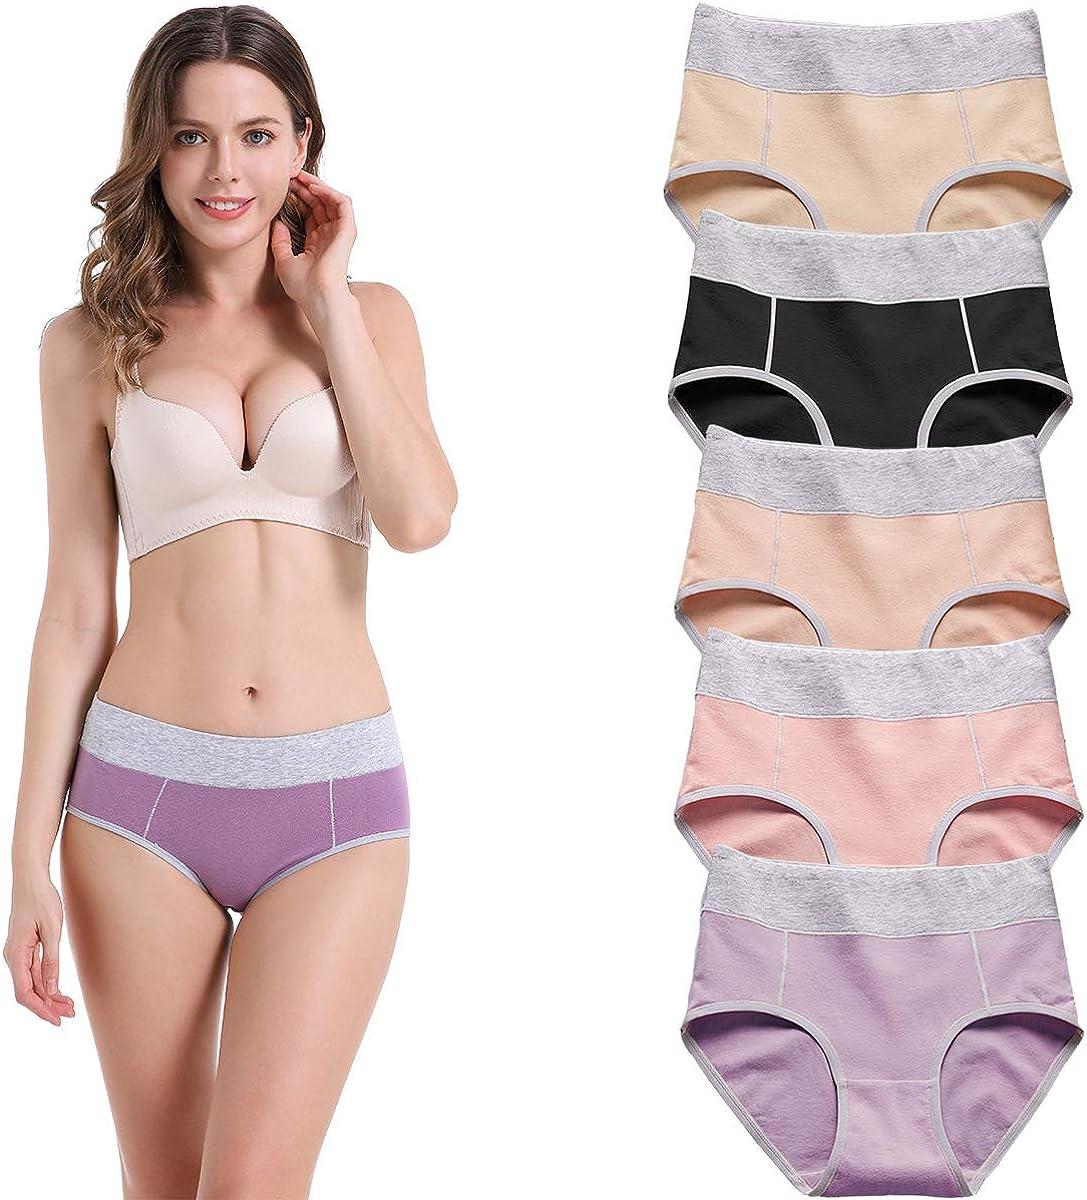 5 Pack YaShaer Womens Mid High Waist Plus Size Cotton Knickers Briefs Underwear Ladies Lingerie Undergarments Full Coverage Panties